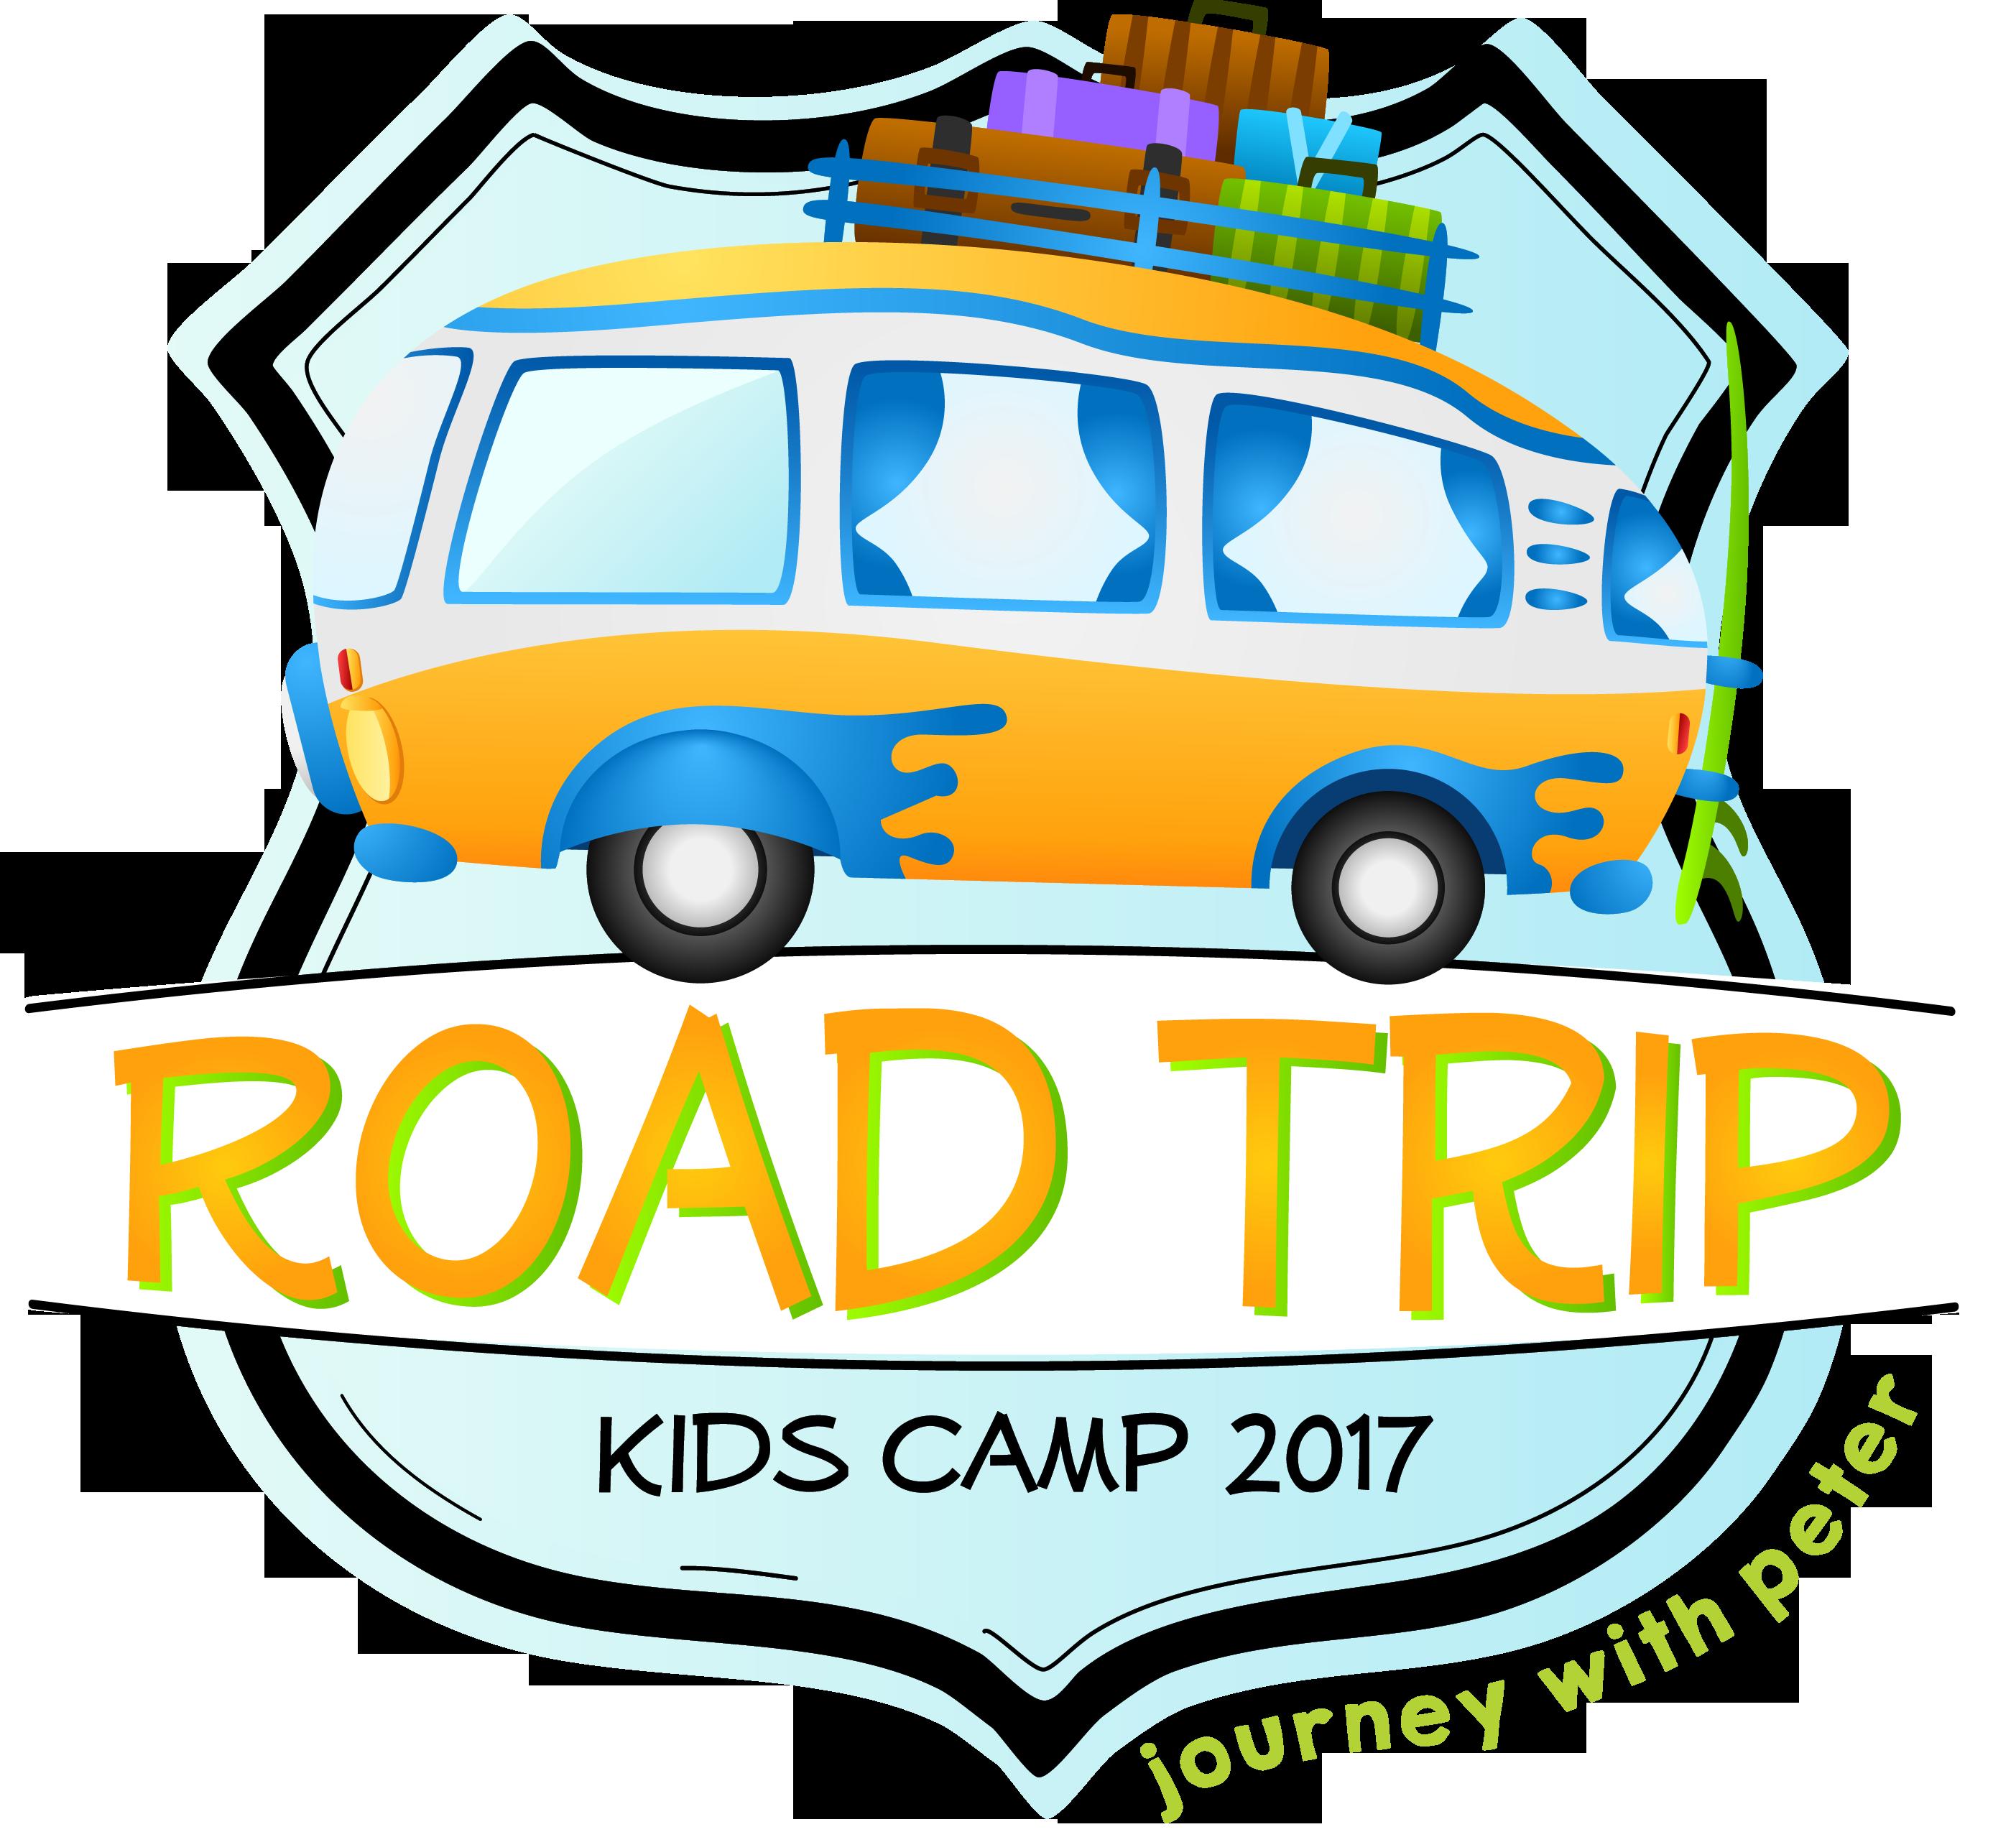 2017 road trip logo